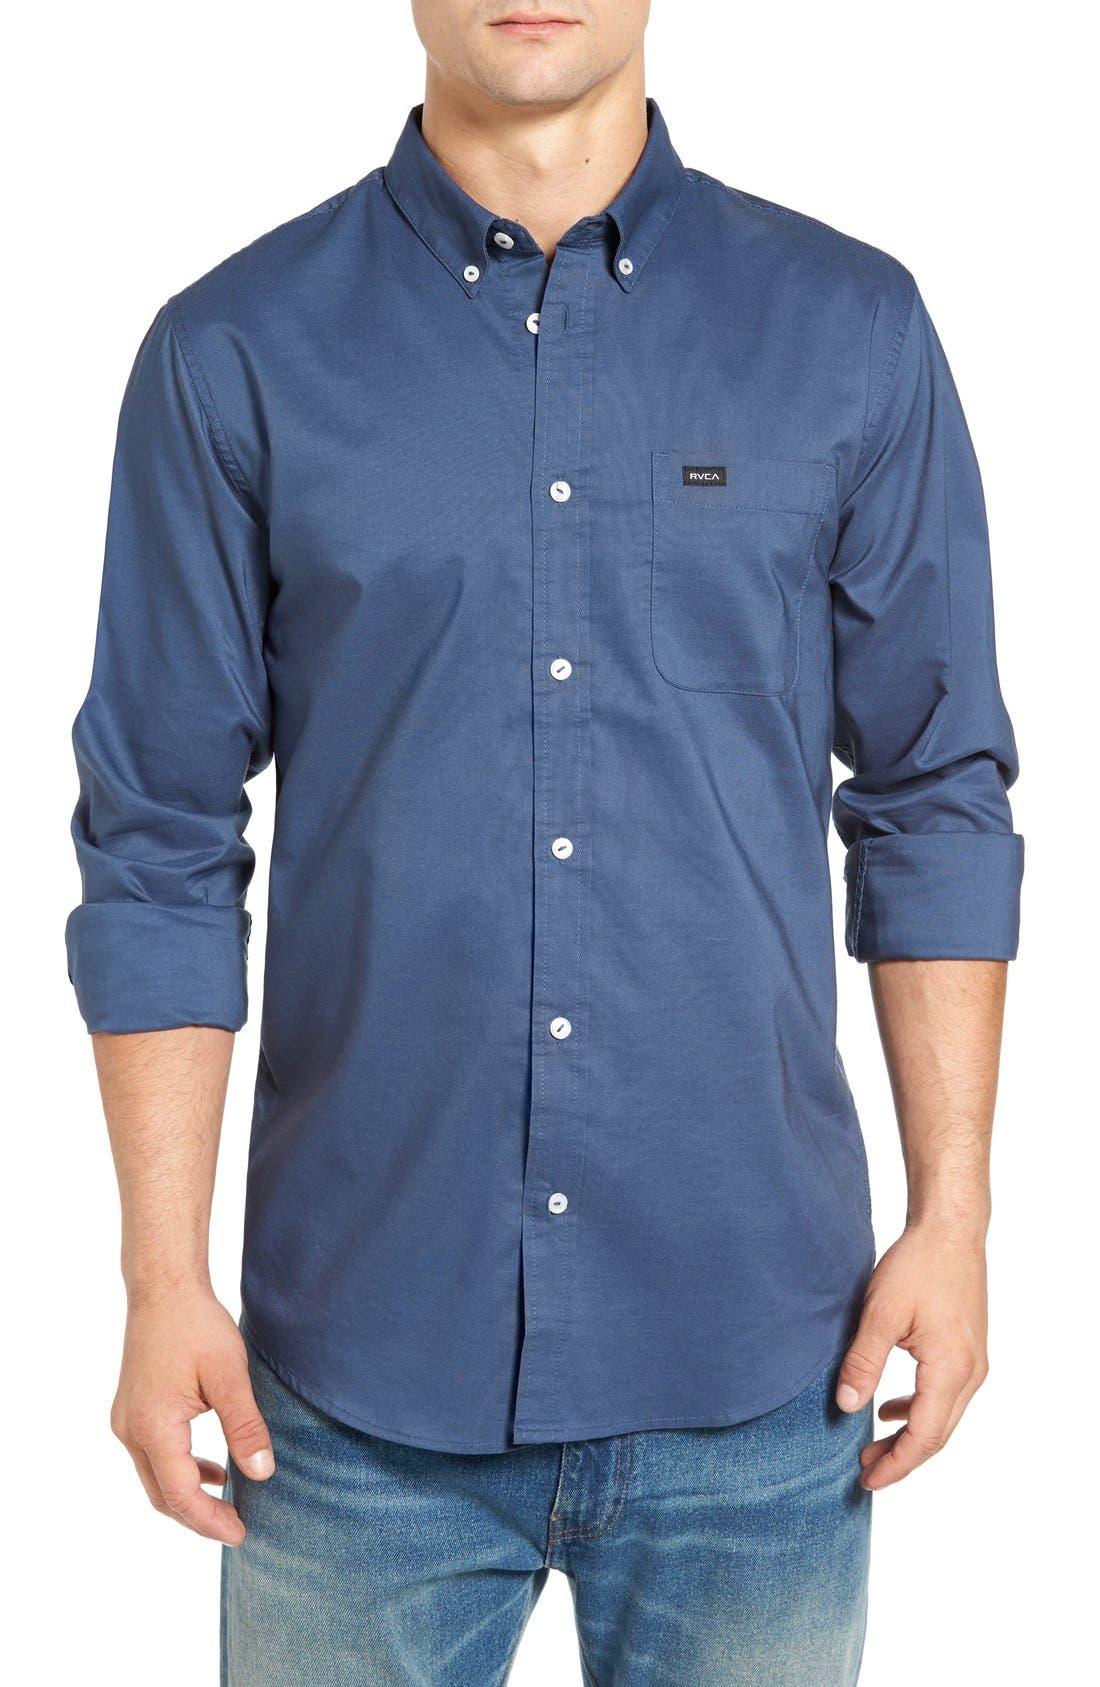 Main Image - RVCA 'That'll Do' Slim Fit Oxford Shirt